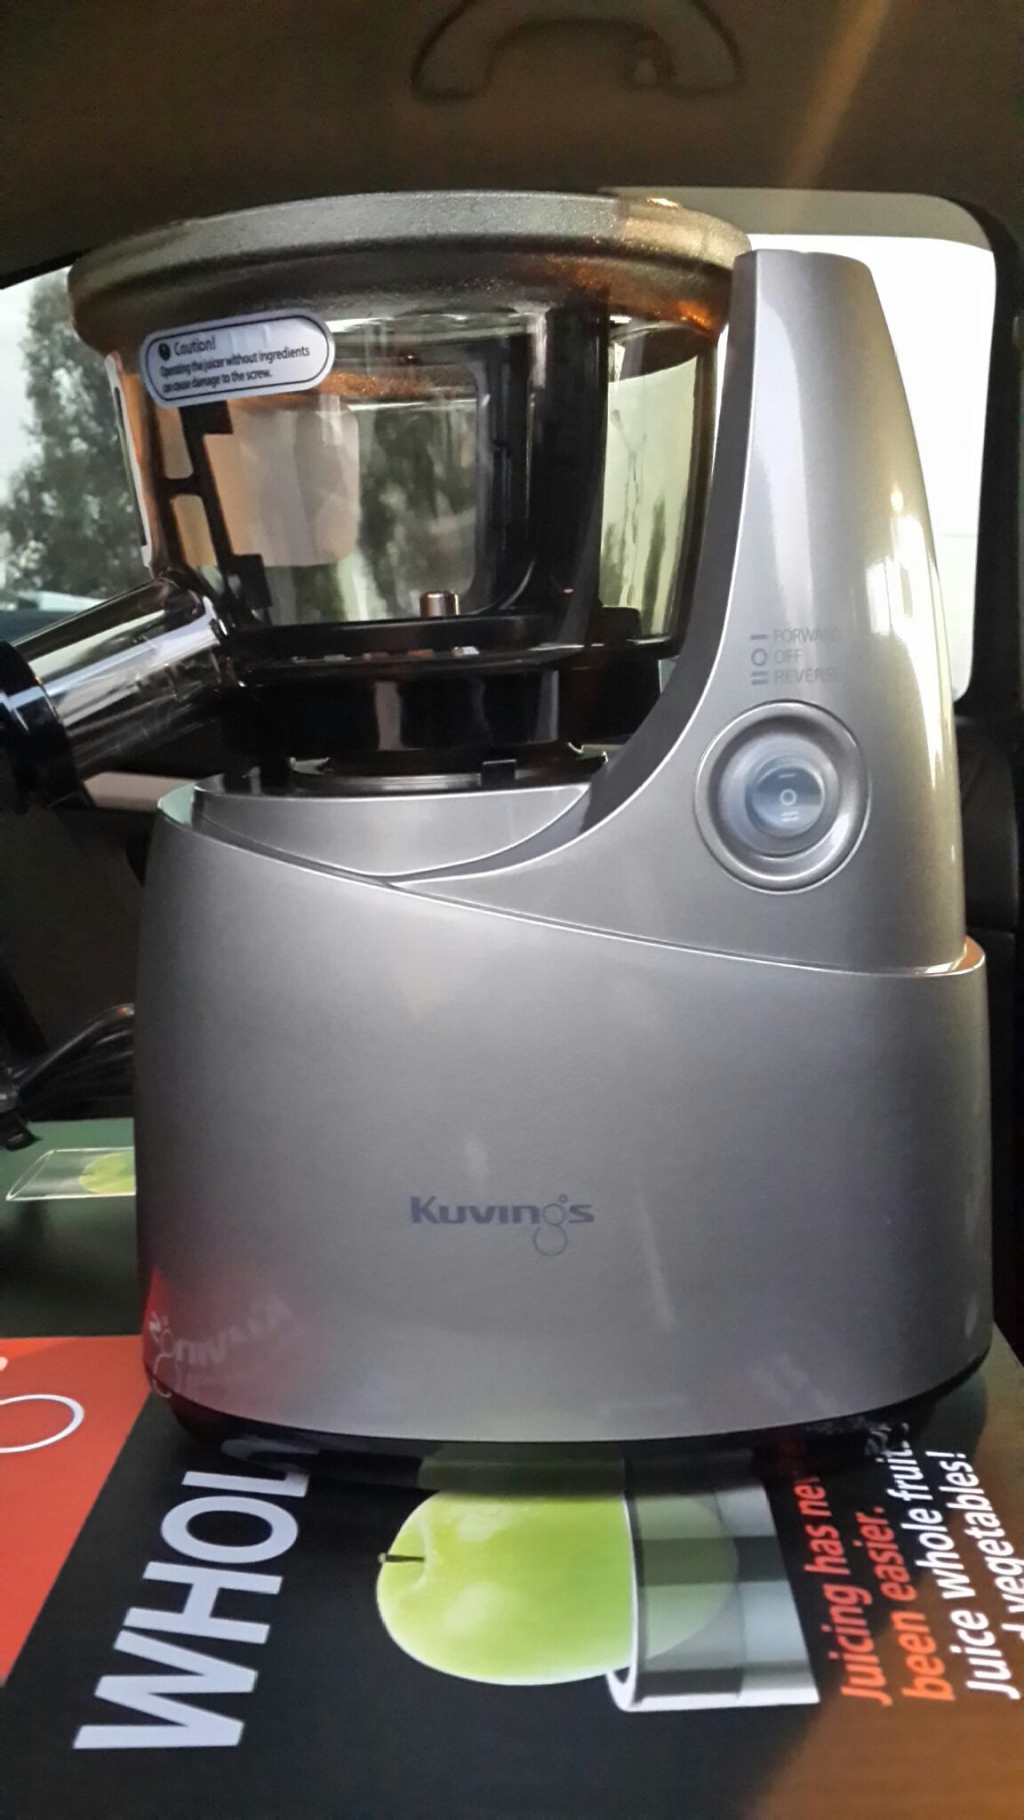 Шнековая соковыжималка Kuvings B6000 - Шнековая соковыжималка Kunings B6000